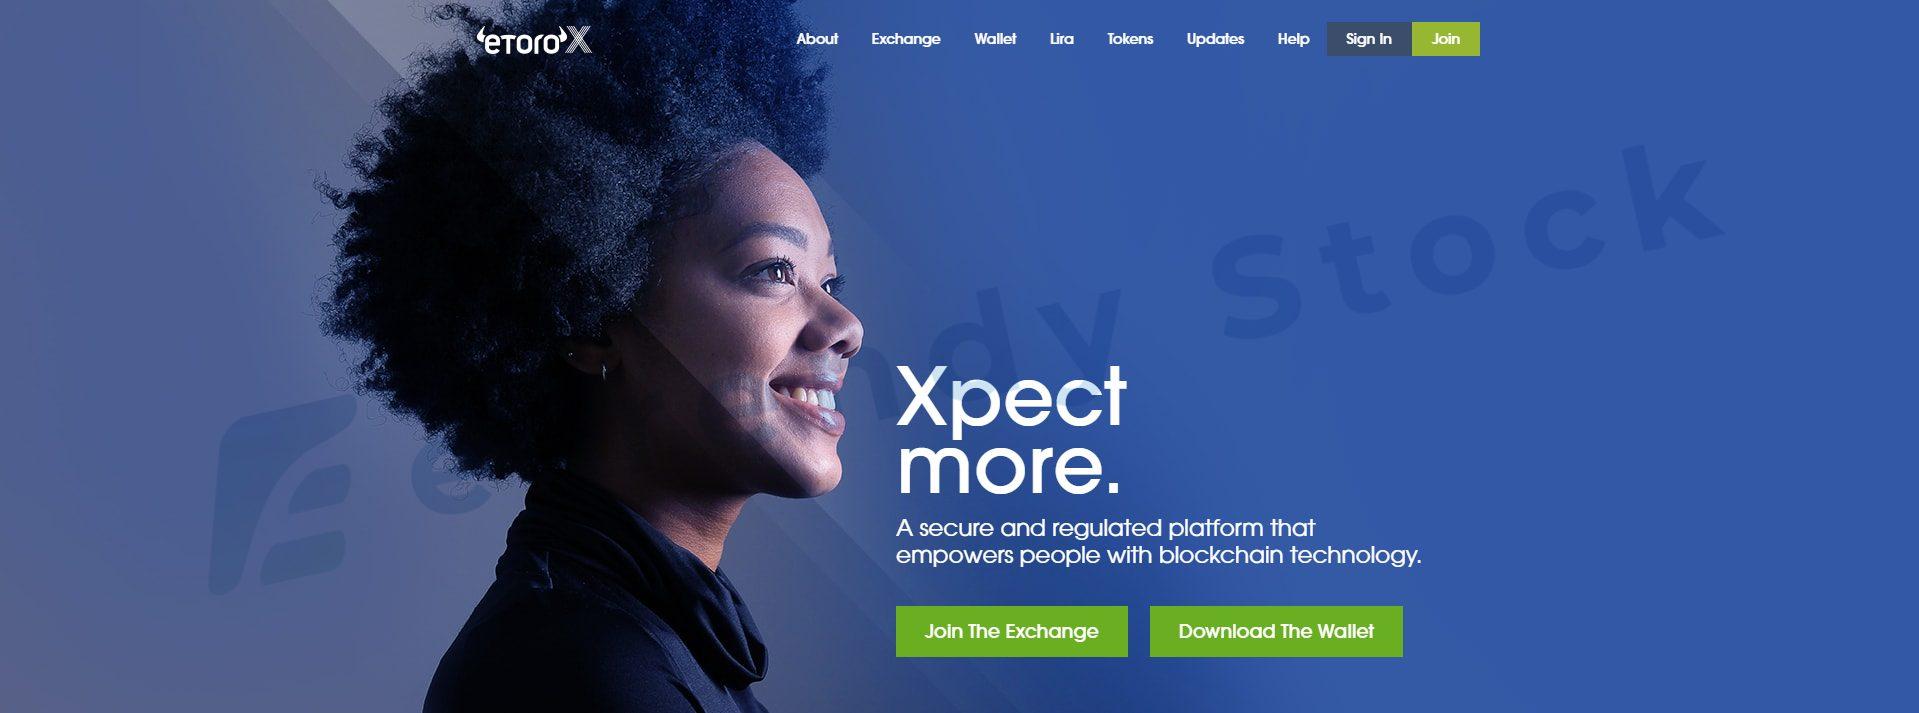 eToro-Review-The-Social-Trading-&-Investment-Platform-eToroX